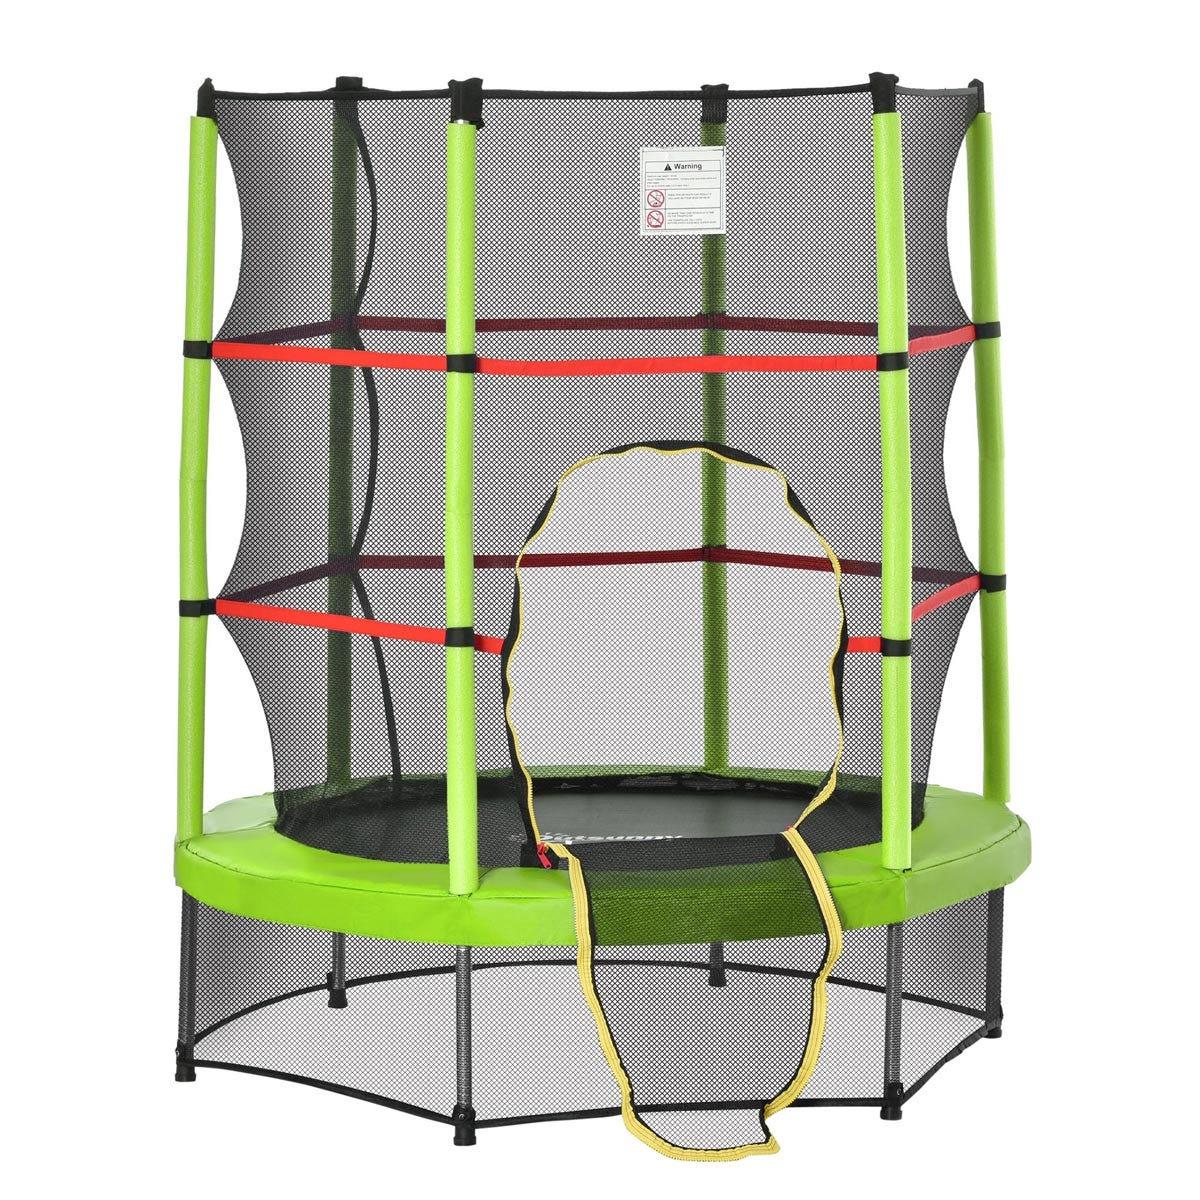 Jouet Kids 140cm Trampoline with Enclosure Net - Green/Red/Black